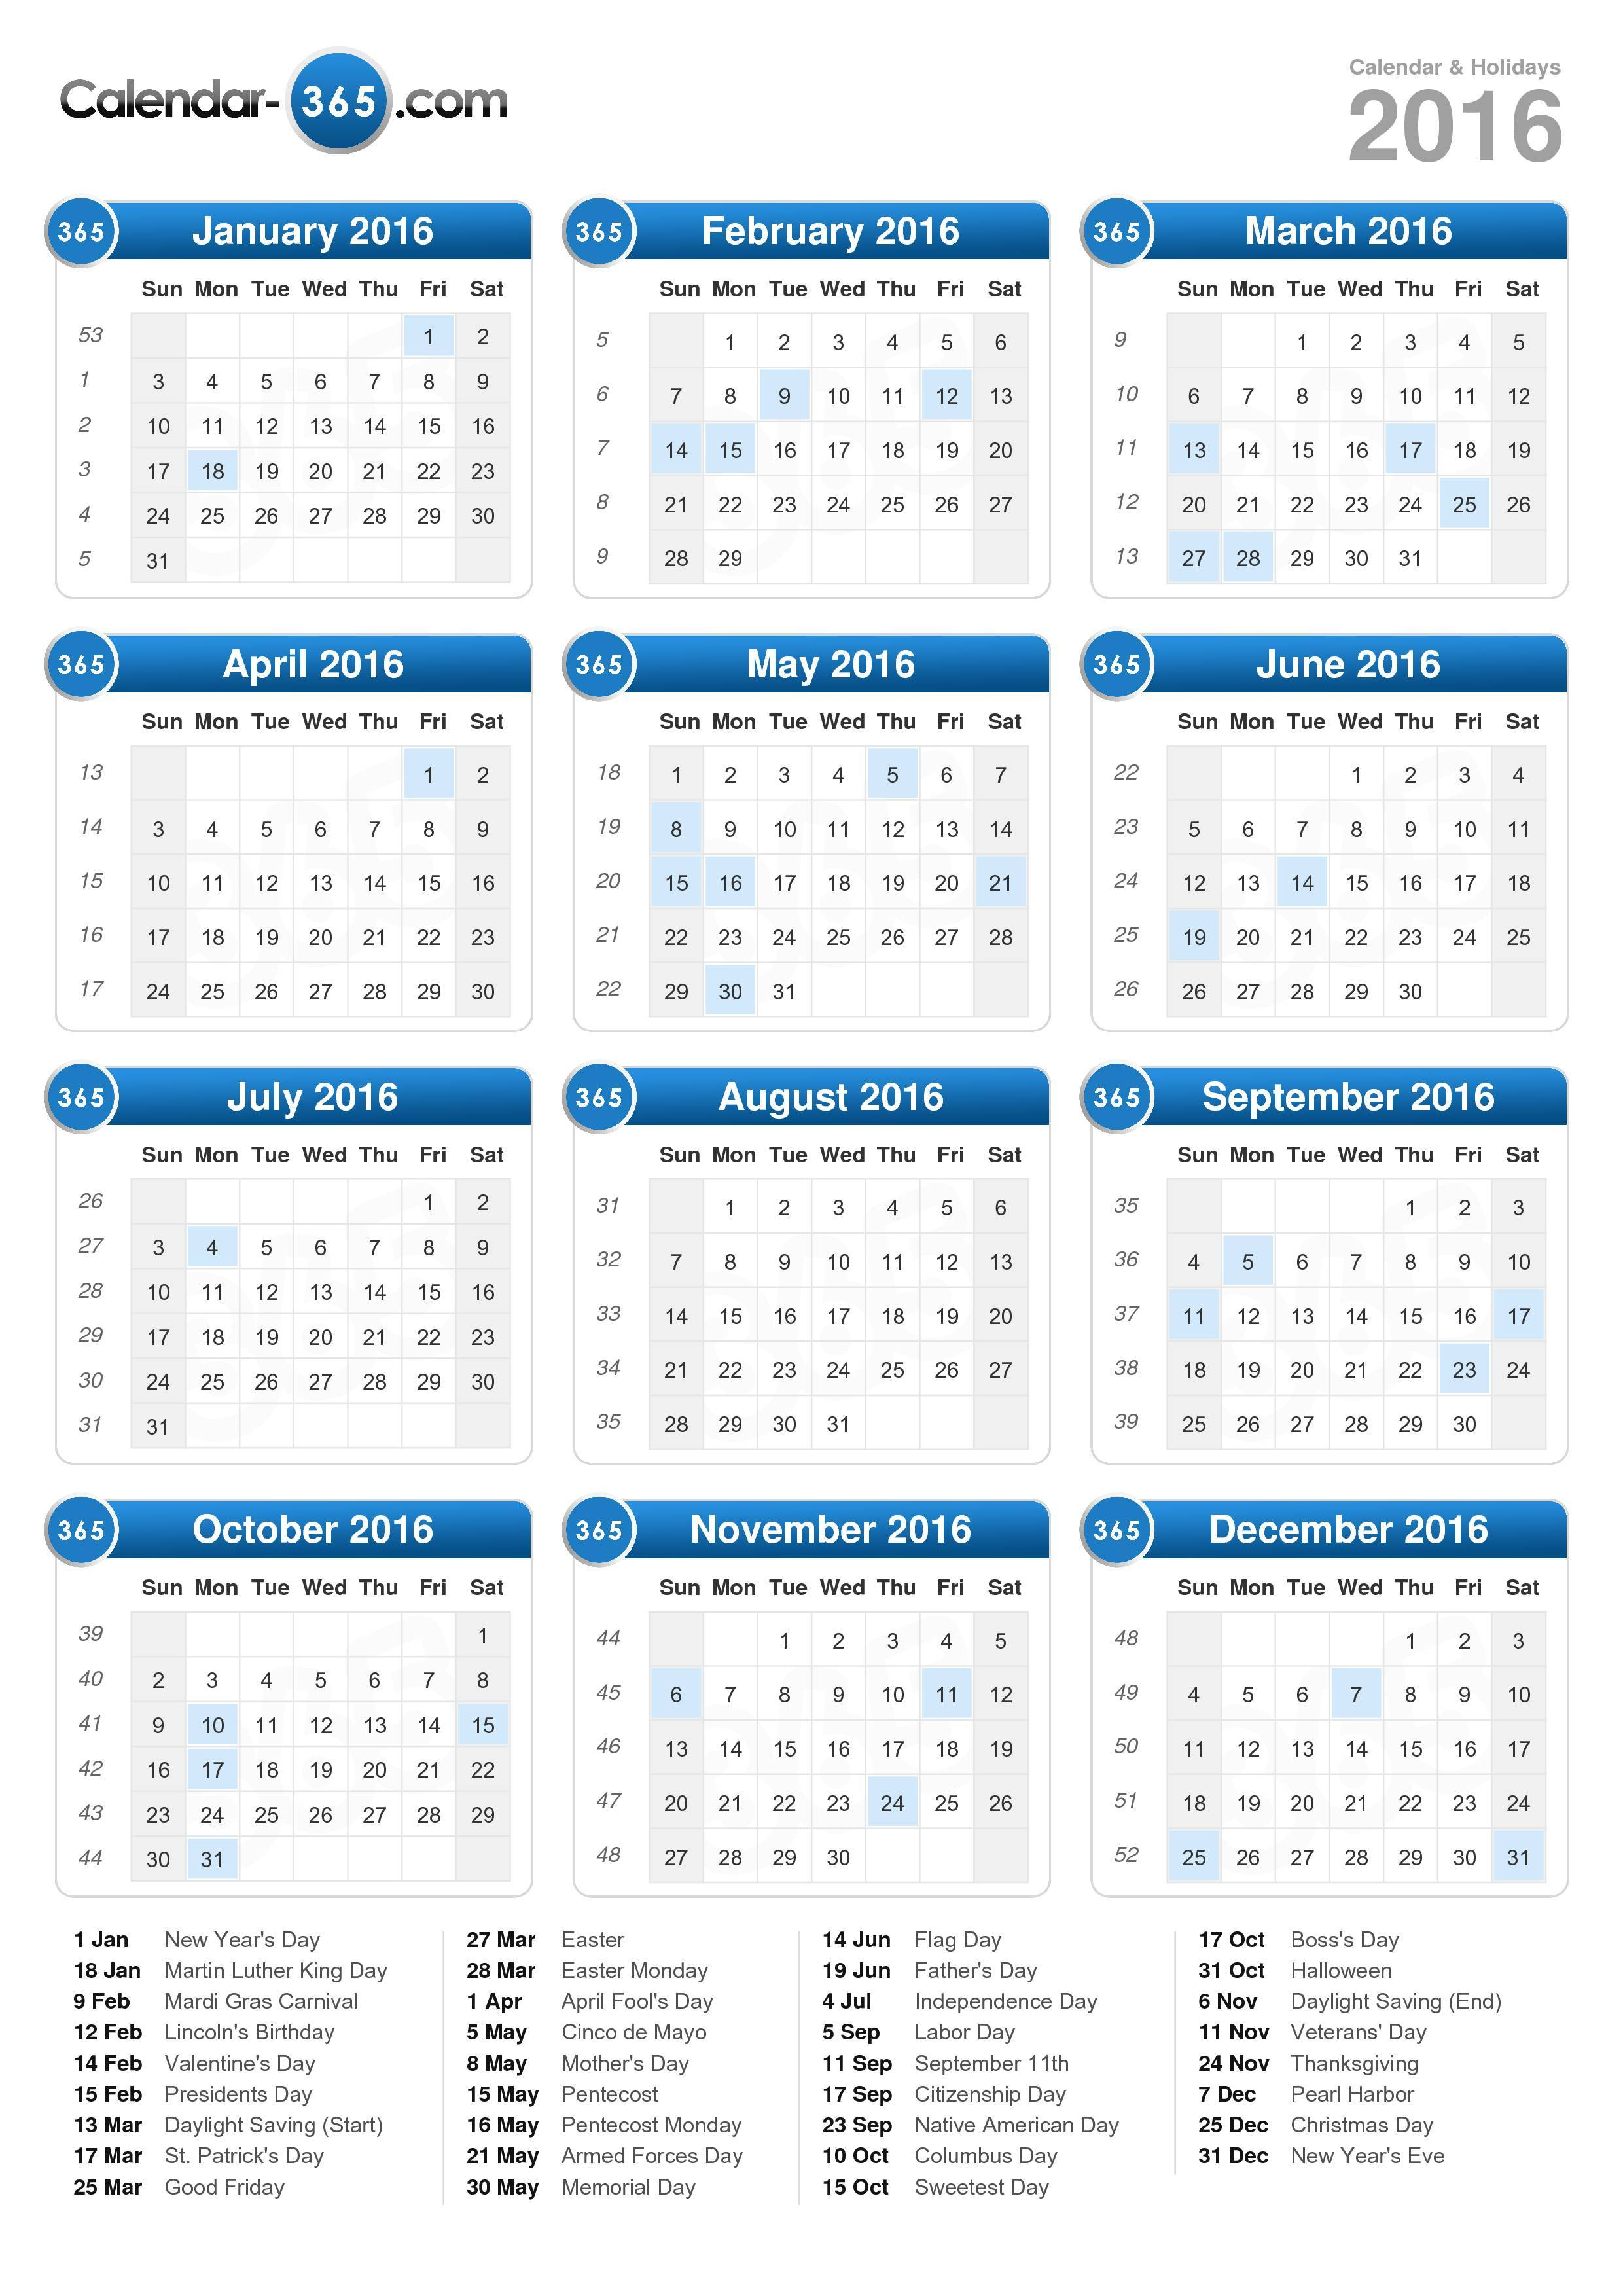 2016 Calendar throughout July 2016 Calendar With Holidays